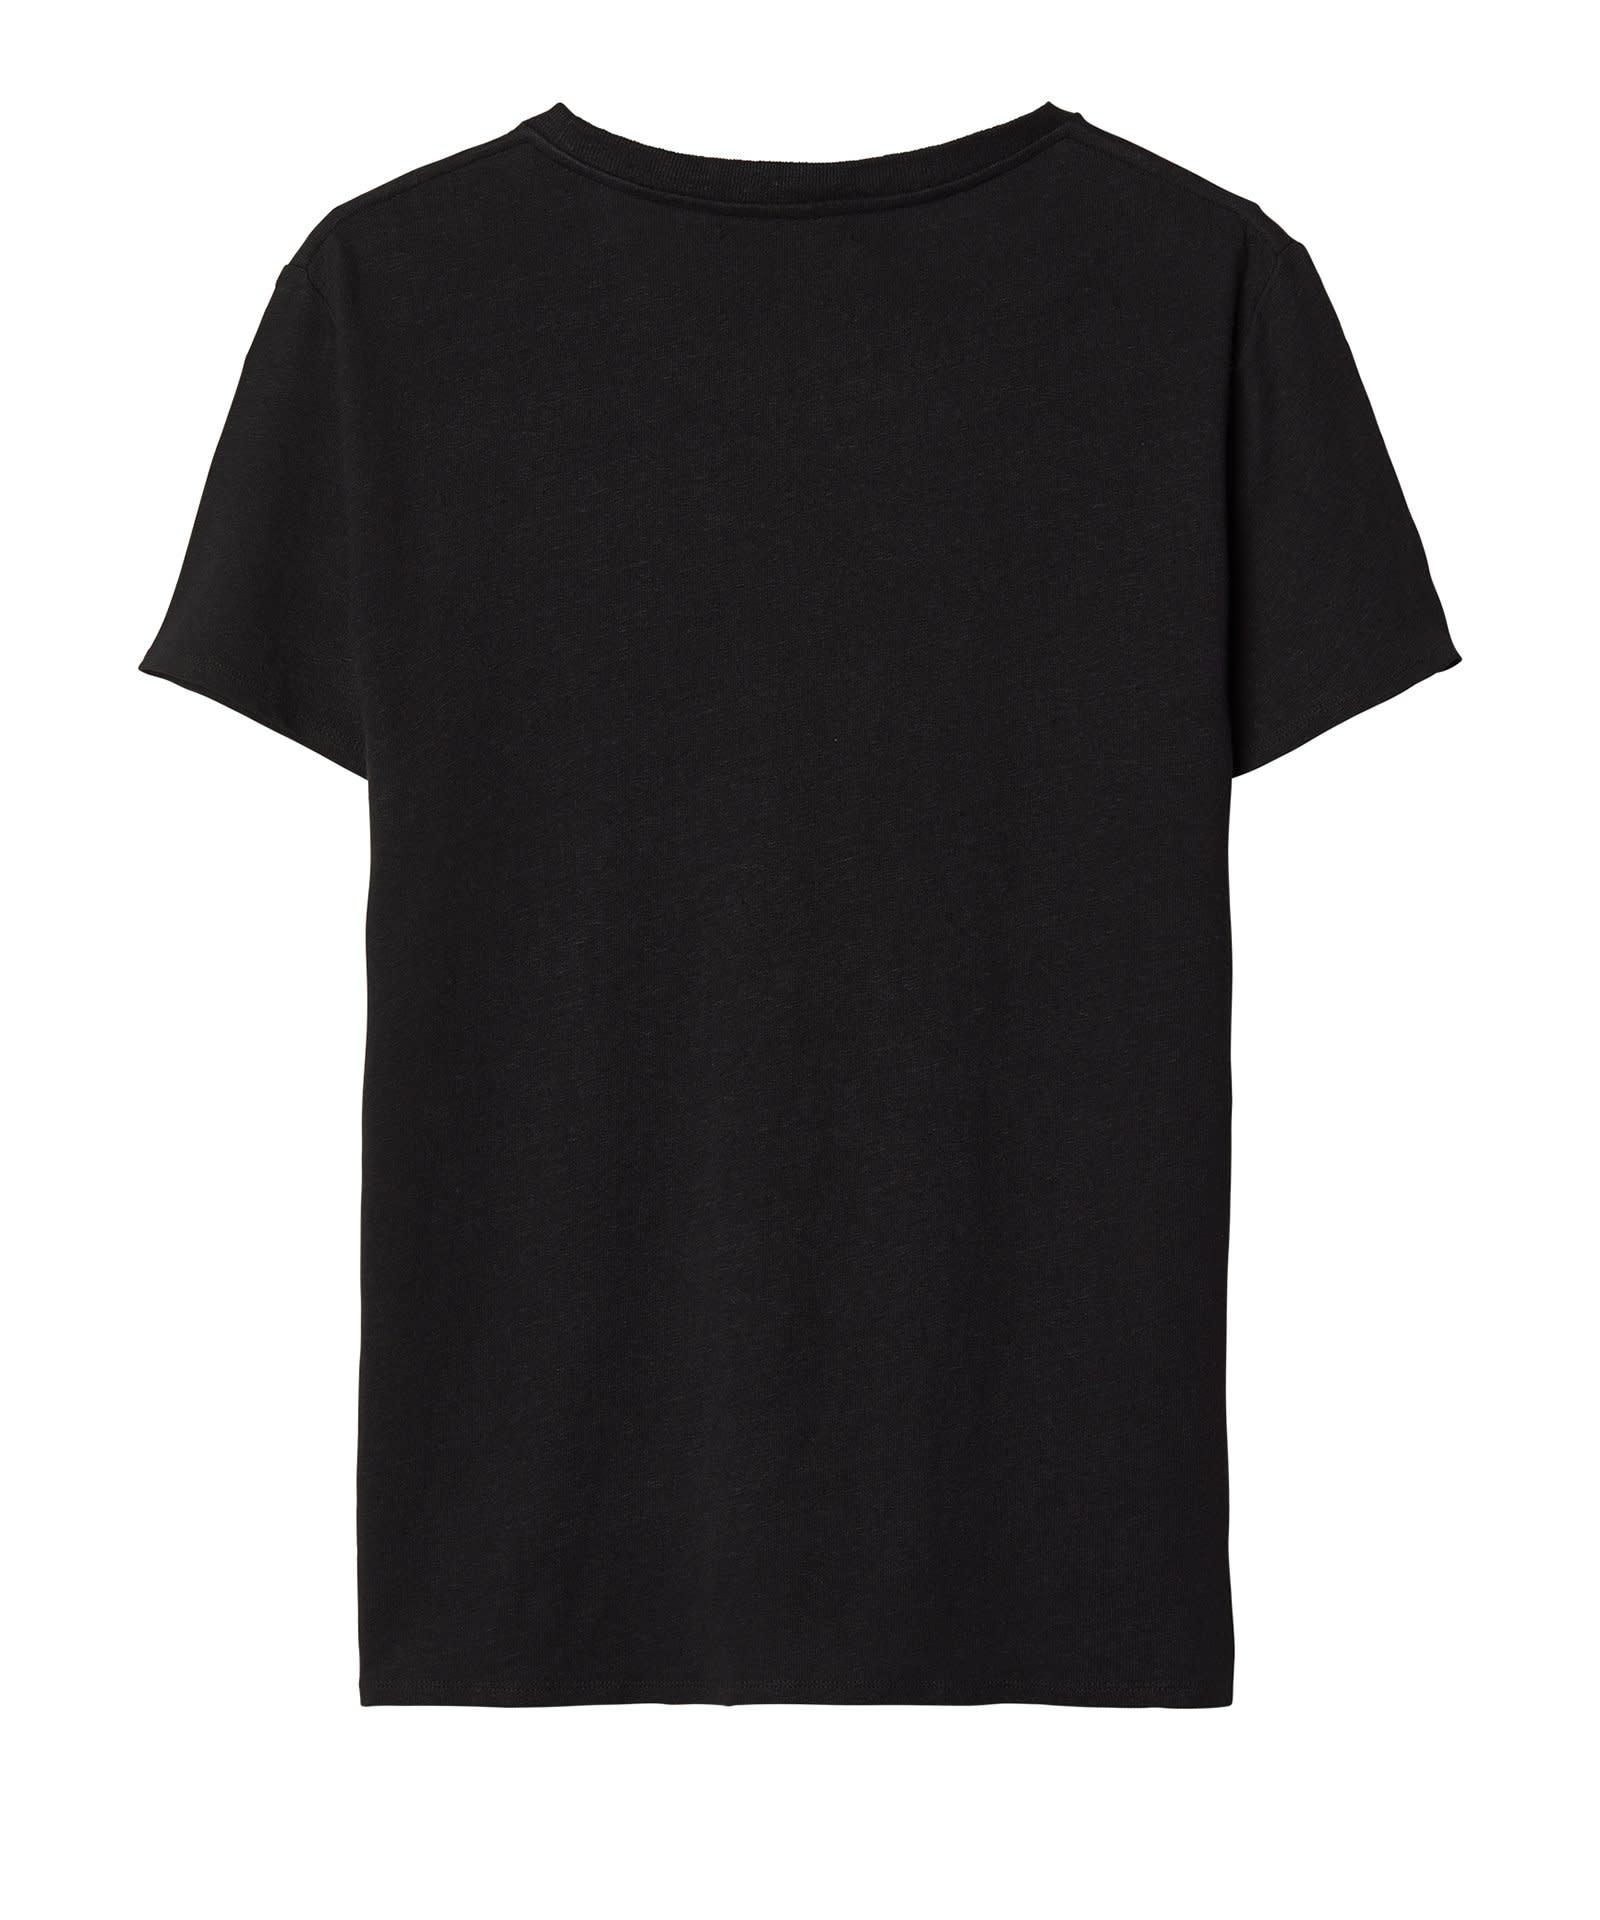 T-shirt No3 Linen Tee black Emilly Marant-3